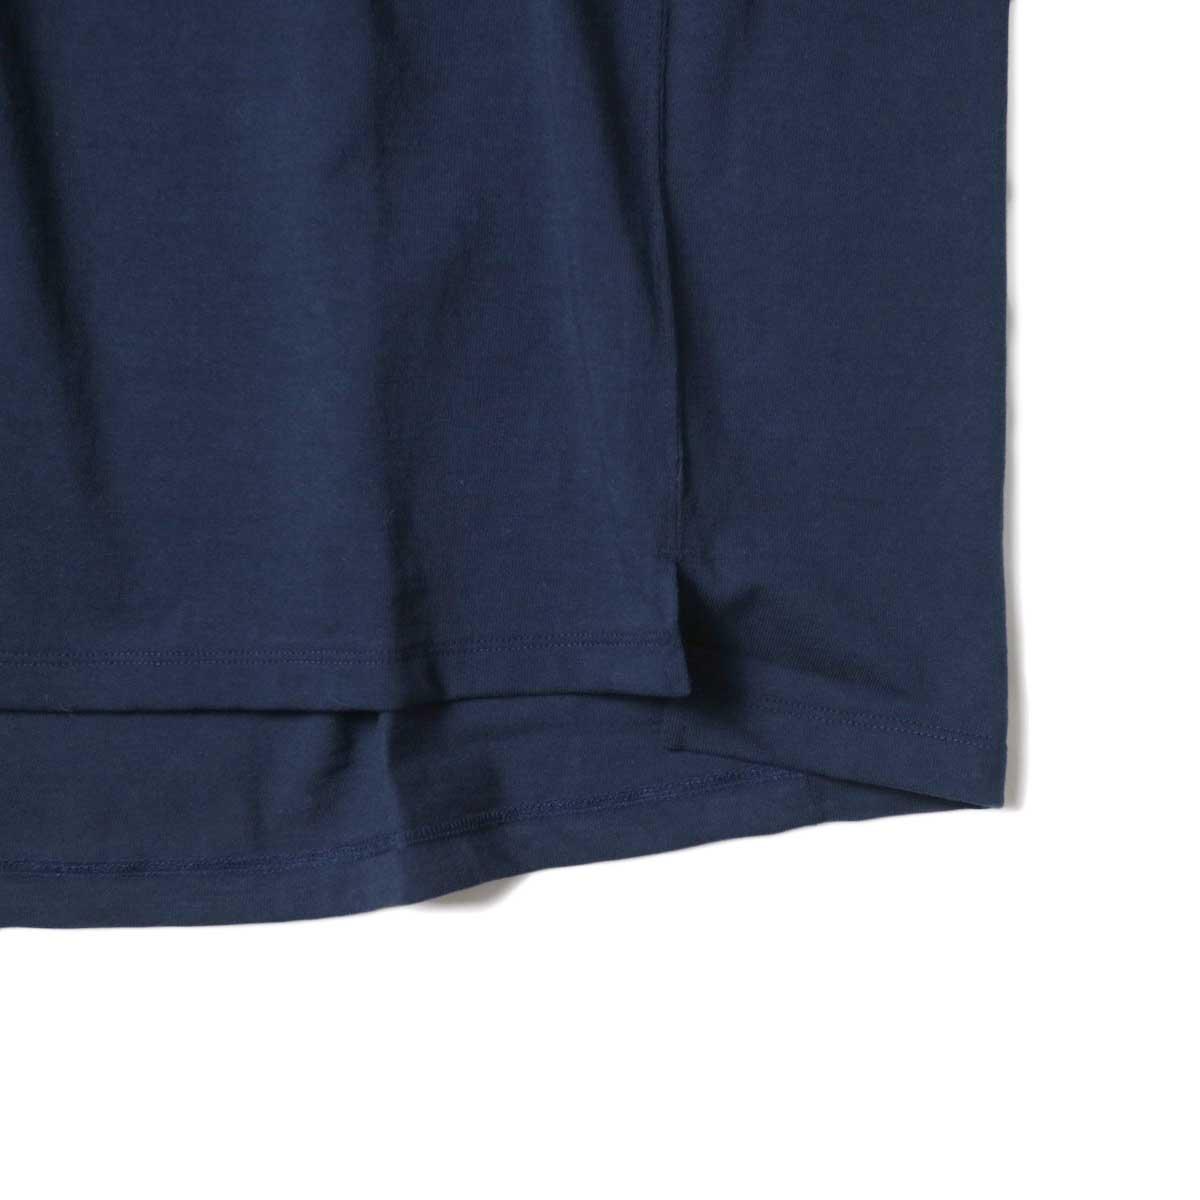 alvana / Protect Football S/S Tee (Dark Navy)裾